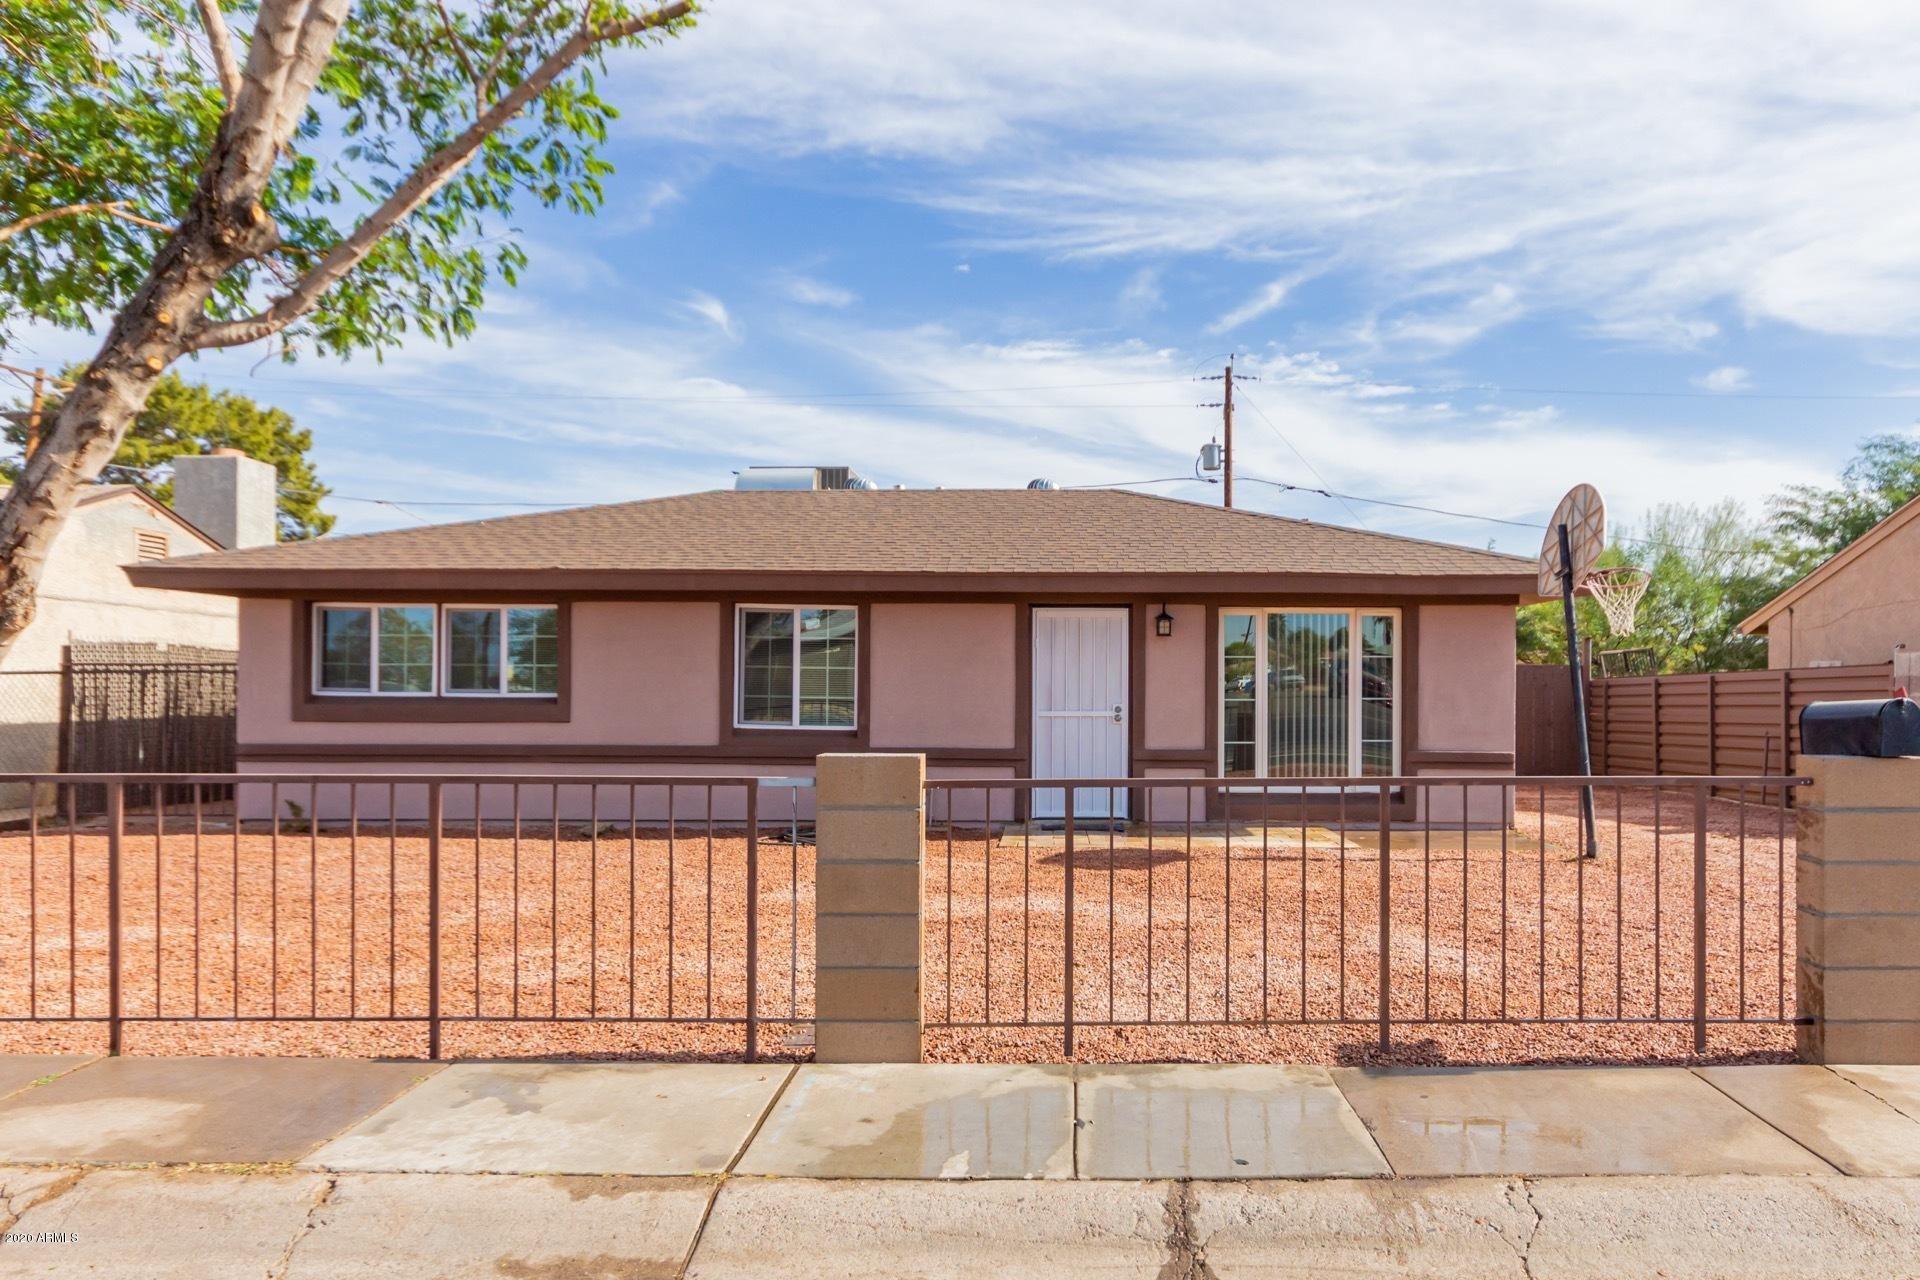 2525 N 39TH Avenue, Phoenix, AZ 85009 - MLS#: 6167623